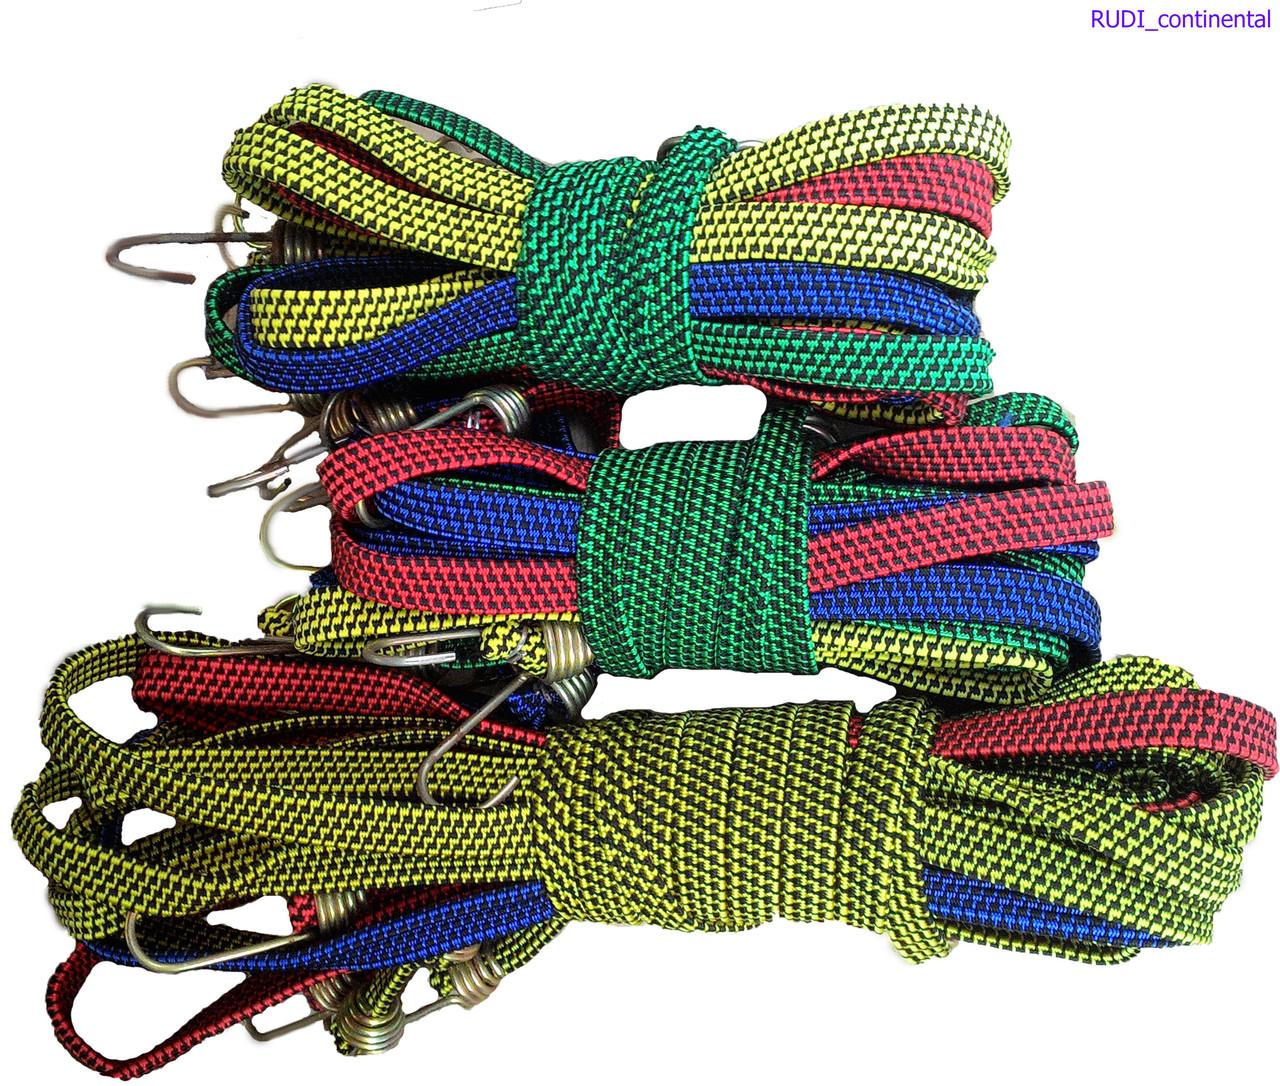 Гумка багажна з гачками 1,5 метрів х 20 мм (10 шт/упак) кольорова плоска